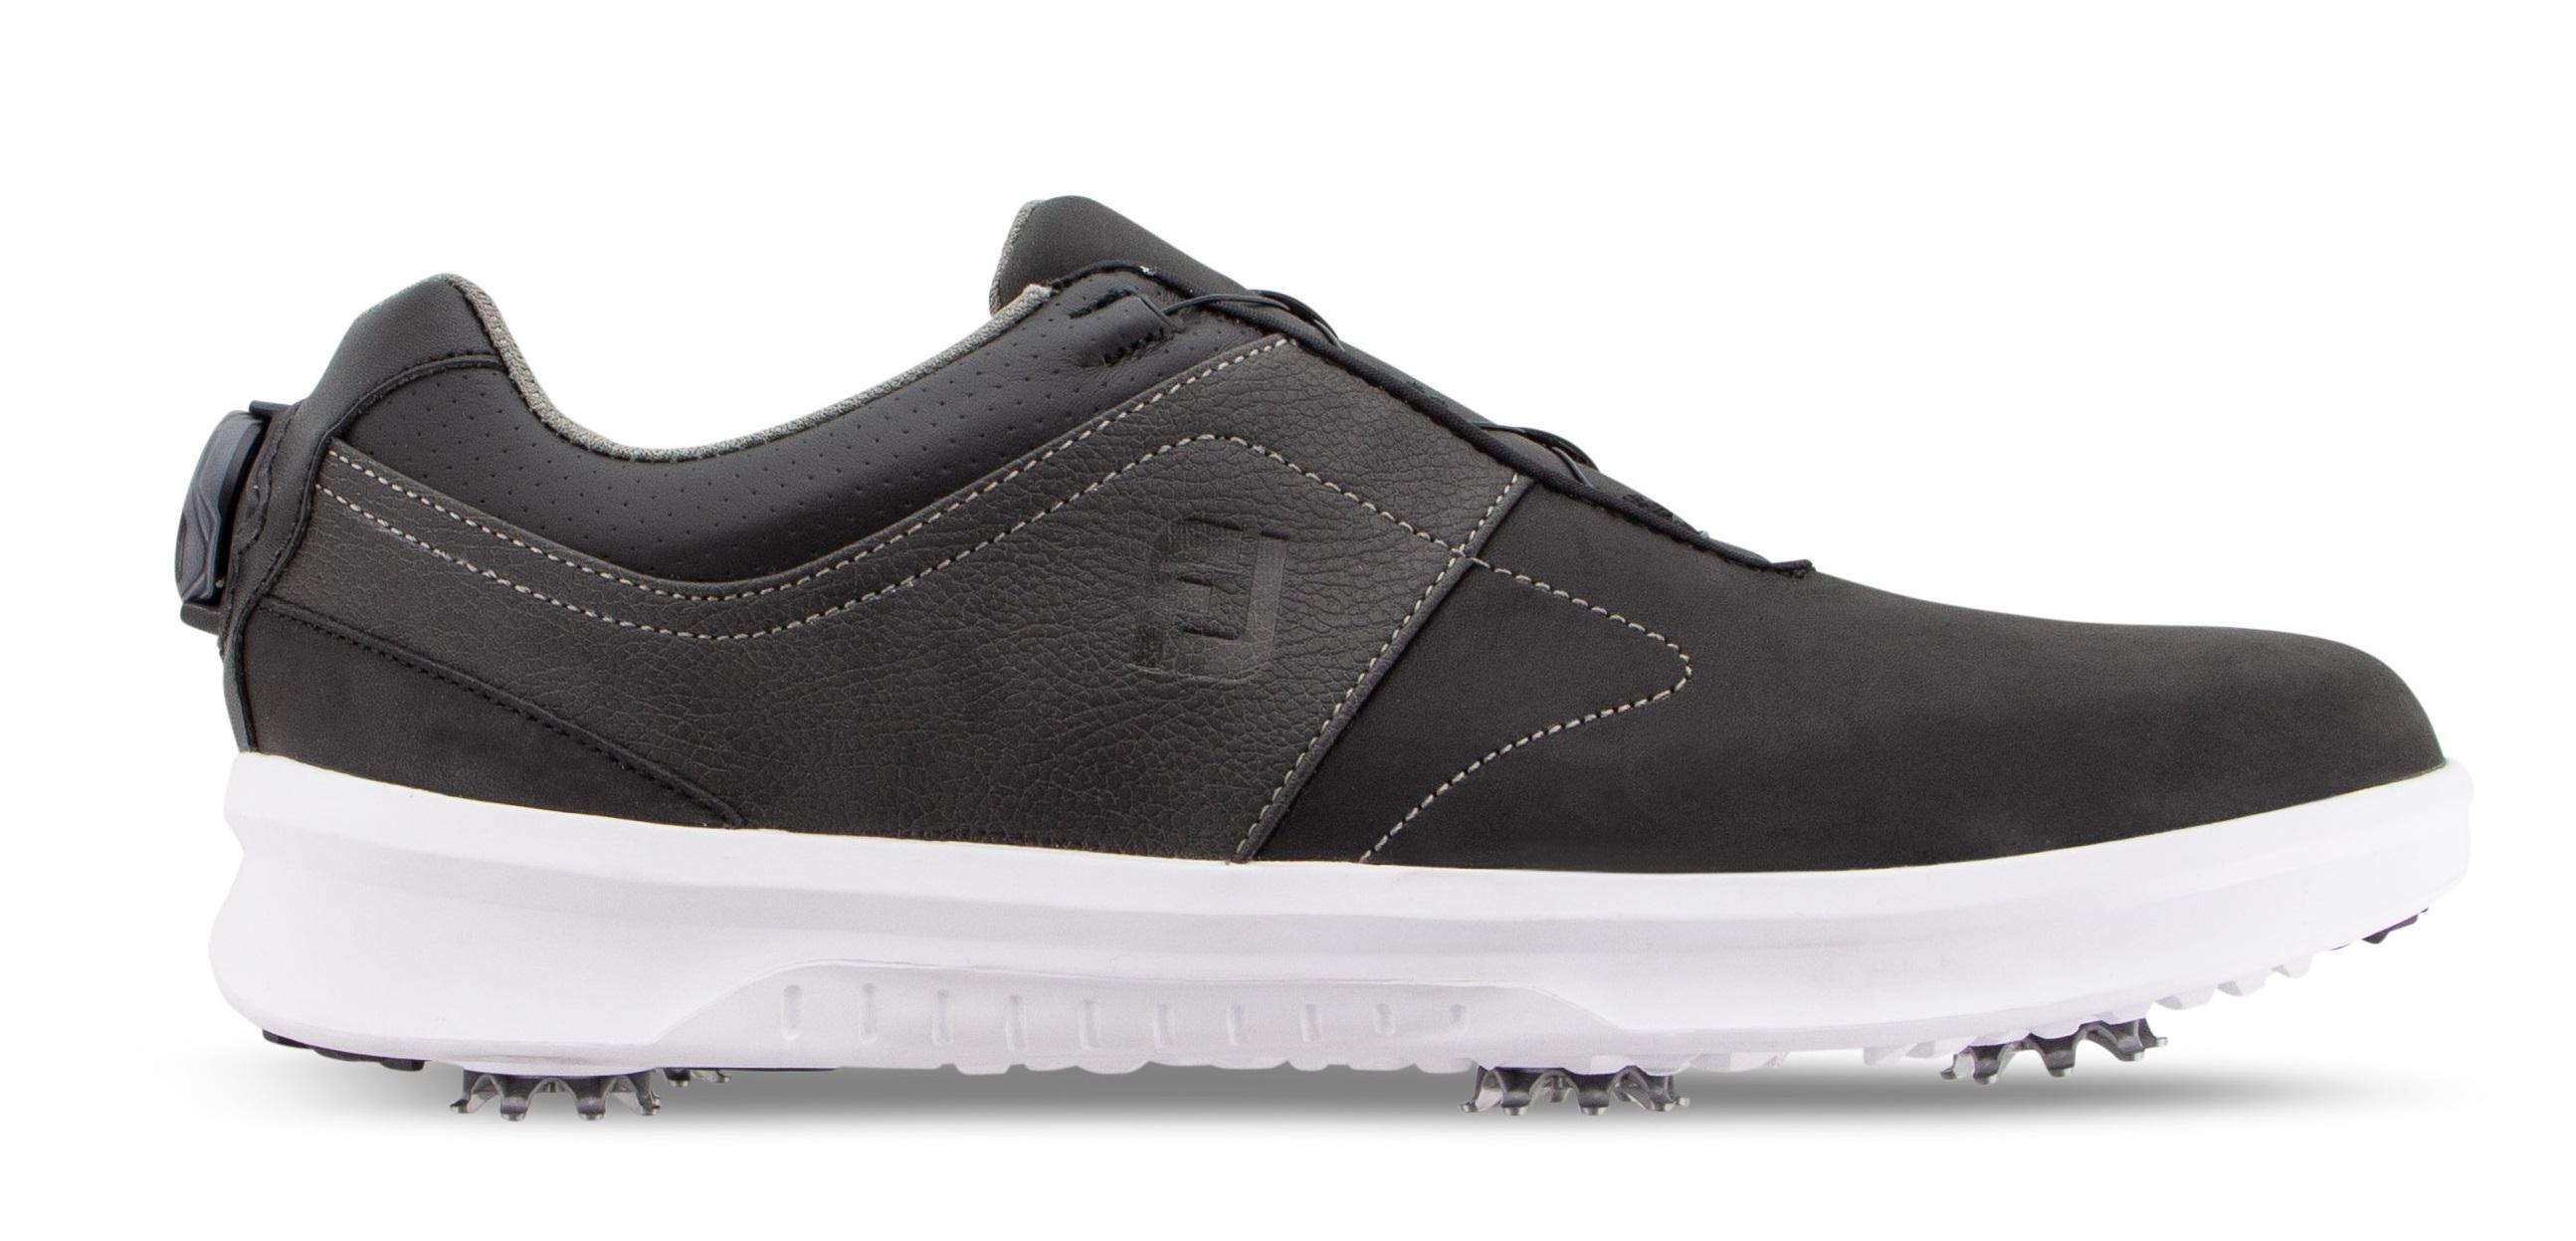 FootJoy Golf- Contour Series BOA Shoes